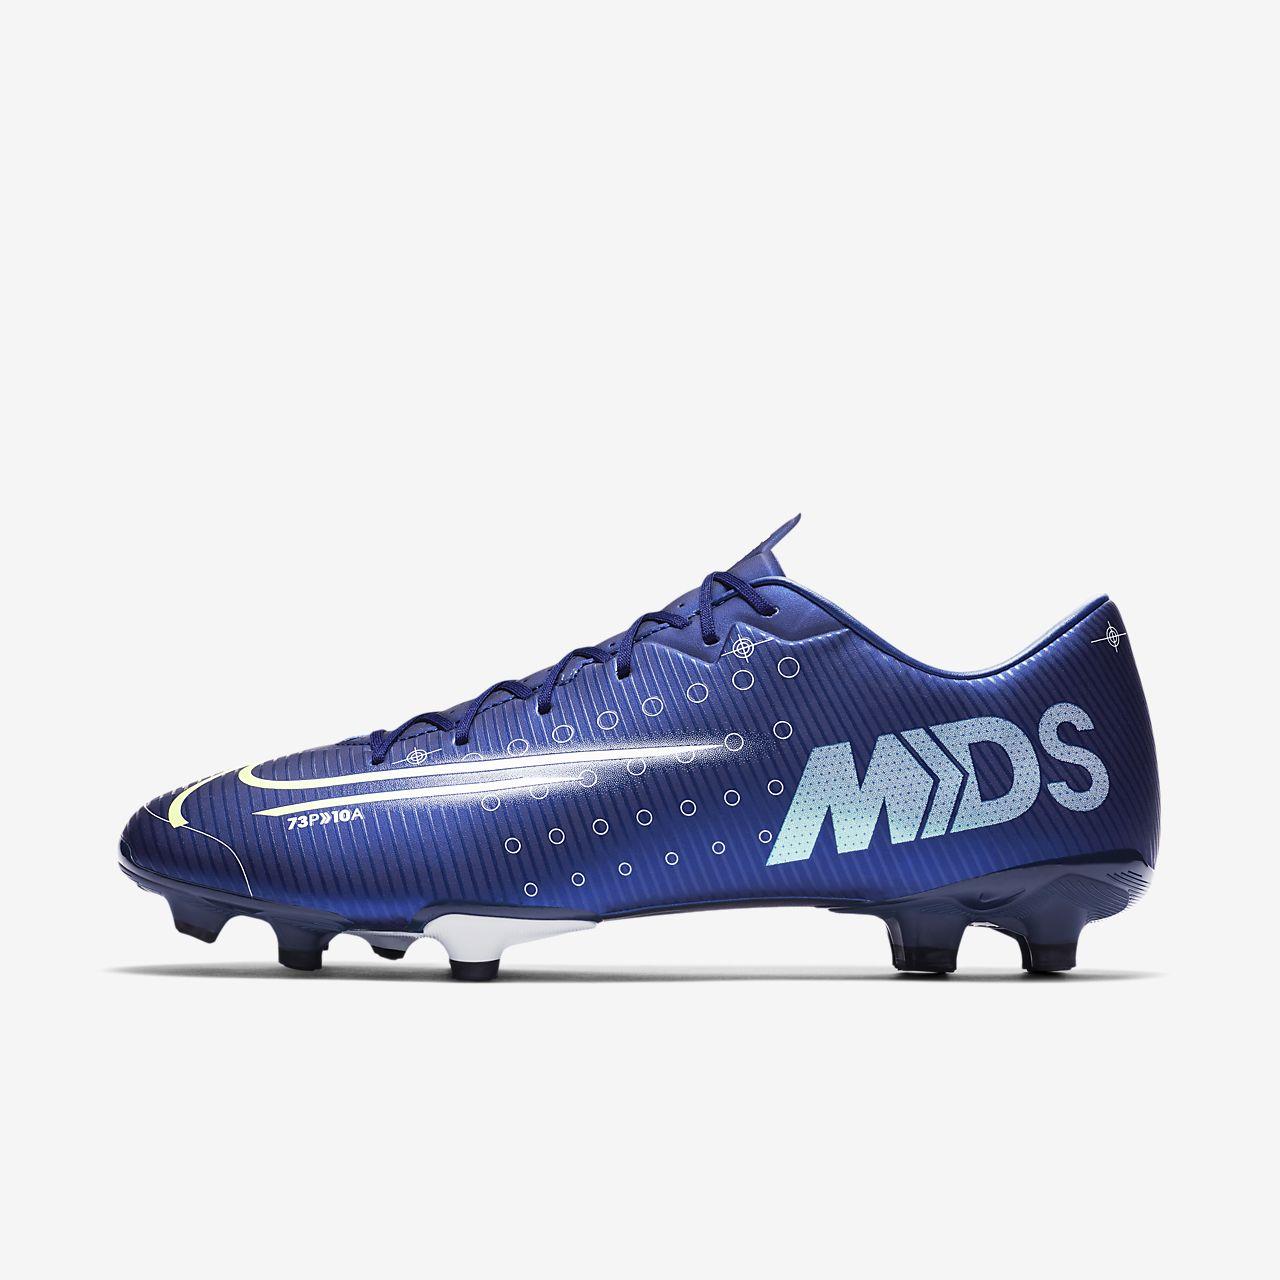 Chaussure de football multi-surfaces à crampons Nike Mercurial Vapor 13 Academy MDS MG